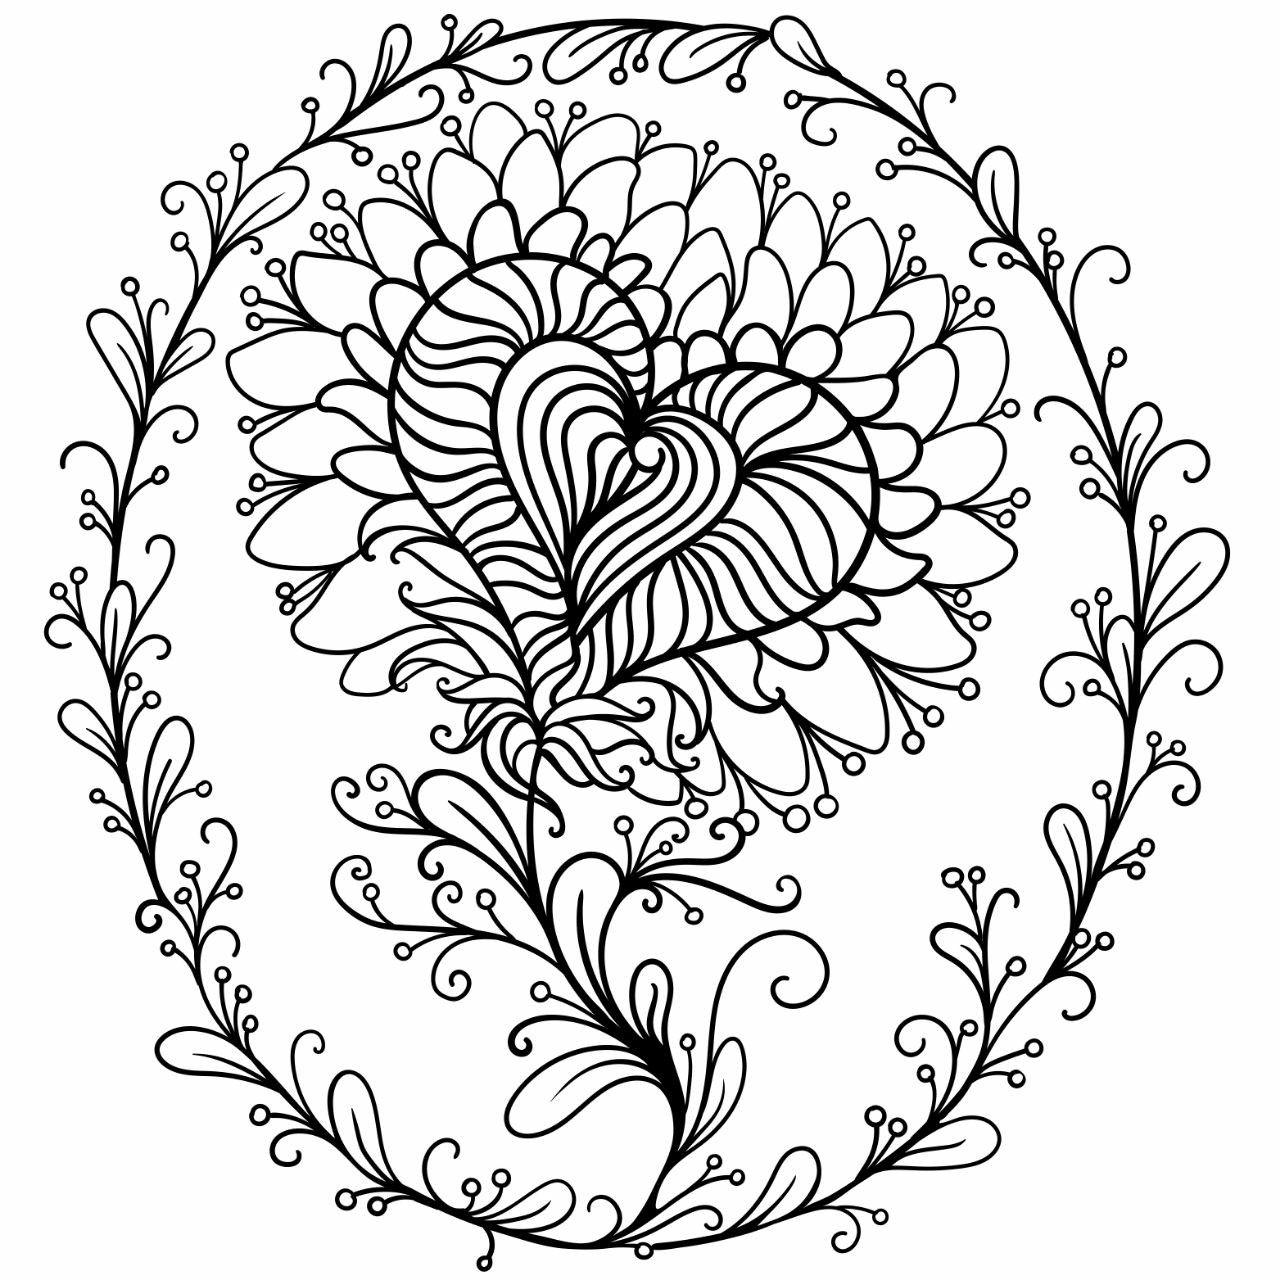 Raskraska Volshebnyj Cvetok Beautiful Magic Flower Coloring Page In 2020 Coloring Books Color Plates